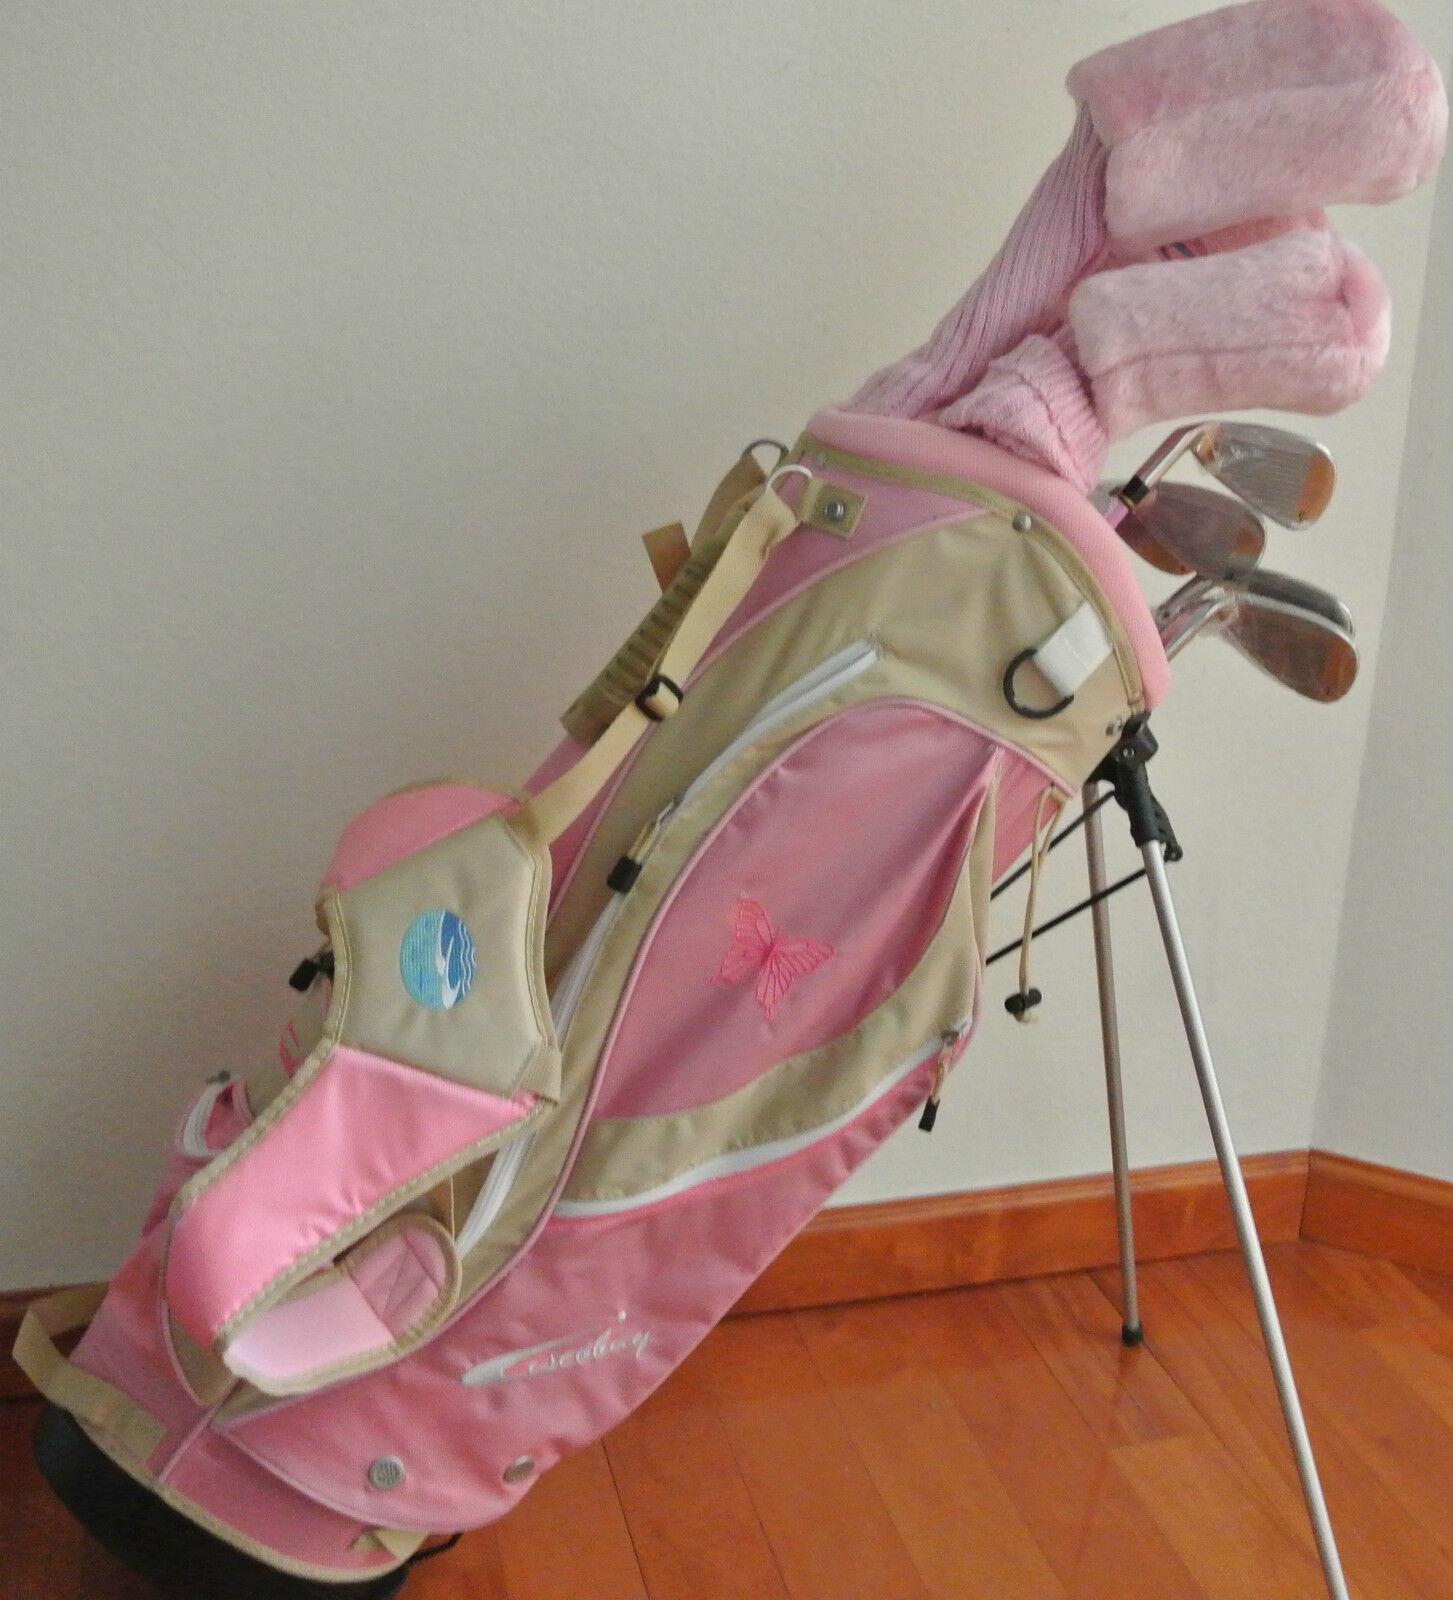 New Ciscobay Hybrid Golf Clubs Ladies Club Pink Set 17 PCS P